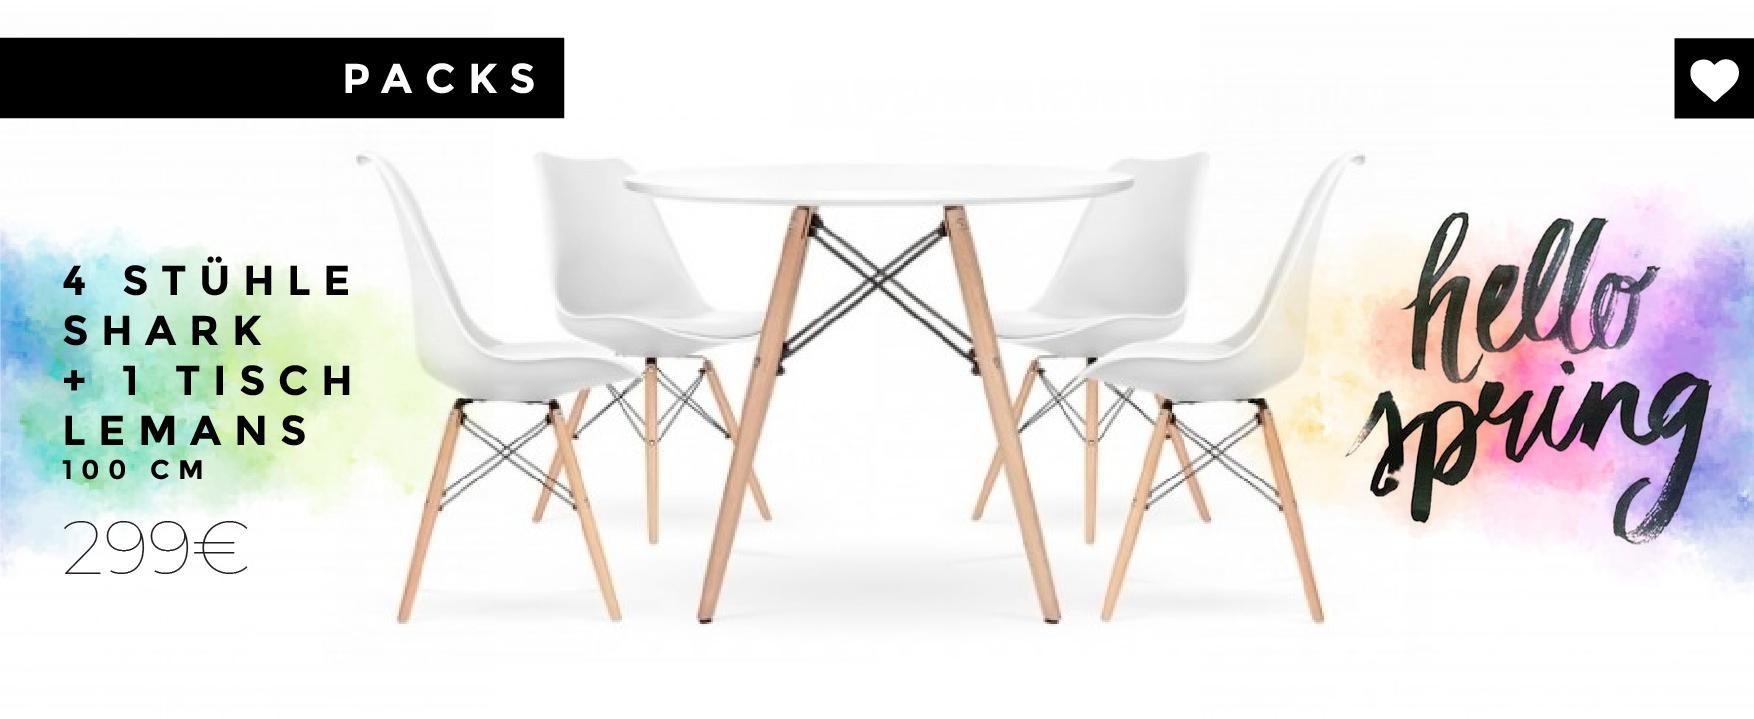 Kombination aus 4 Shark-Stühlen, inspiriert vom berühmten DSW-Stuhl